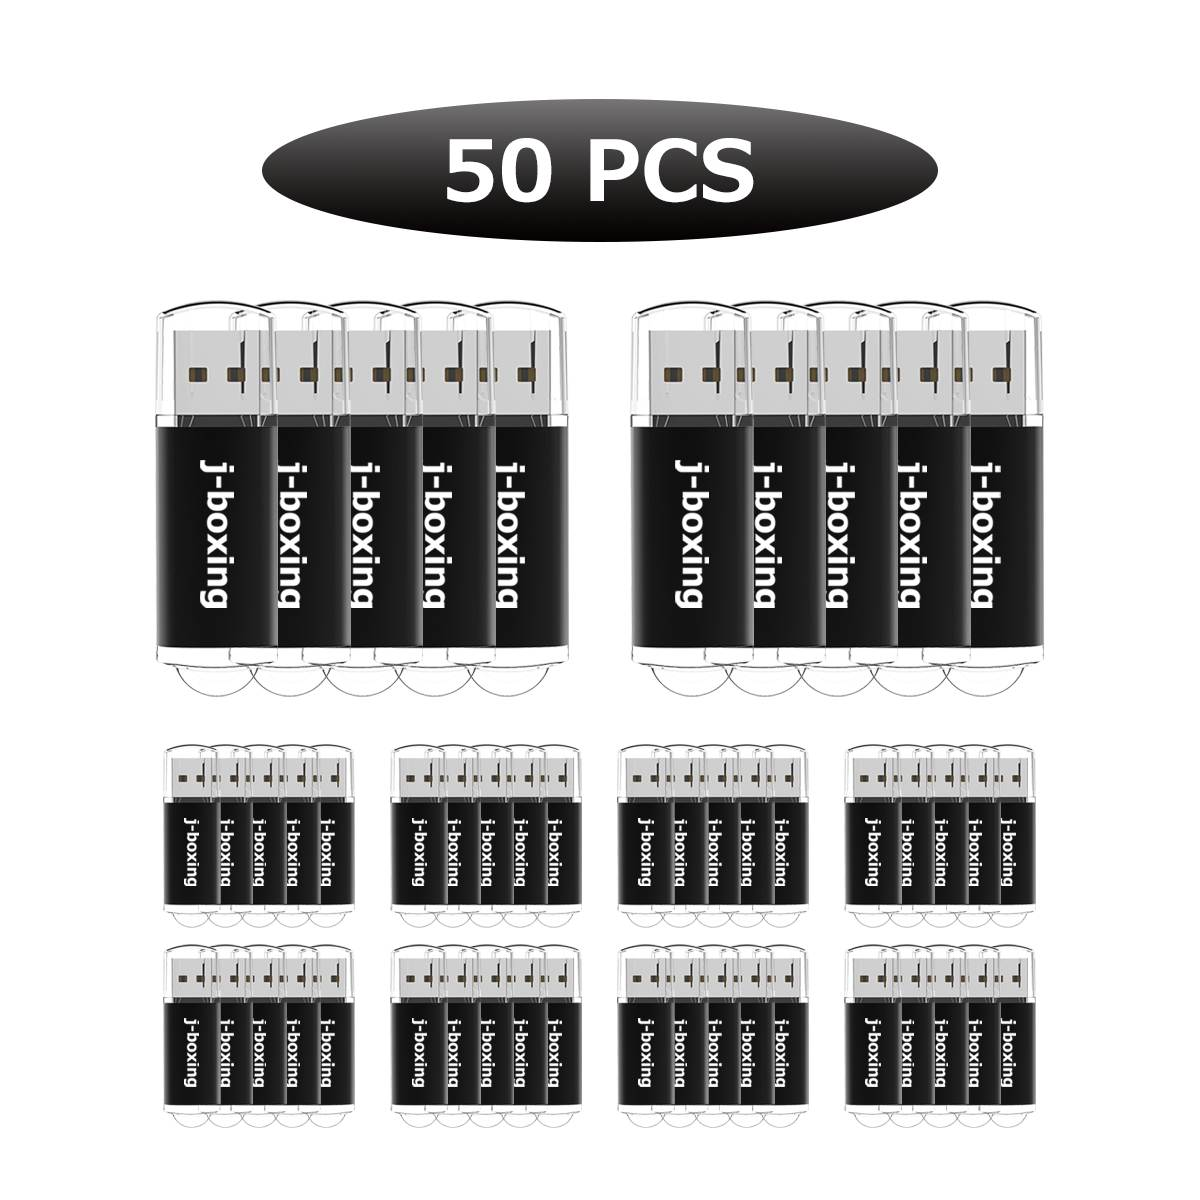 J-boxing 50PCS 4GB USB Flash Rectangle Memory Stick Pen Drive for Computer Laptop Tablet Mac Thumb Flash Drive Storage 8 Colours enlarge